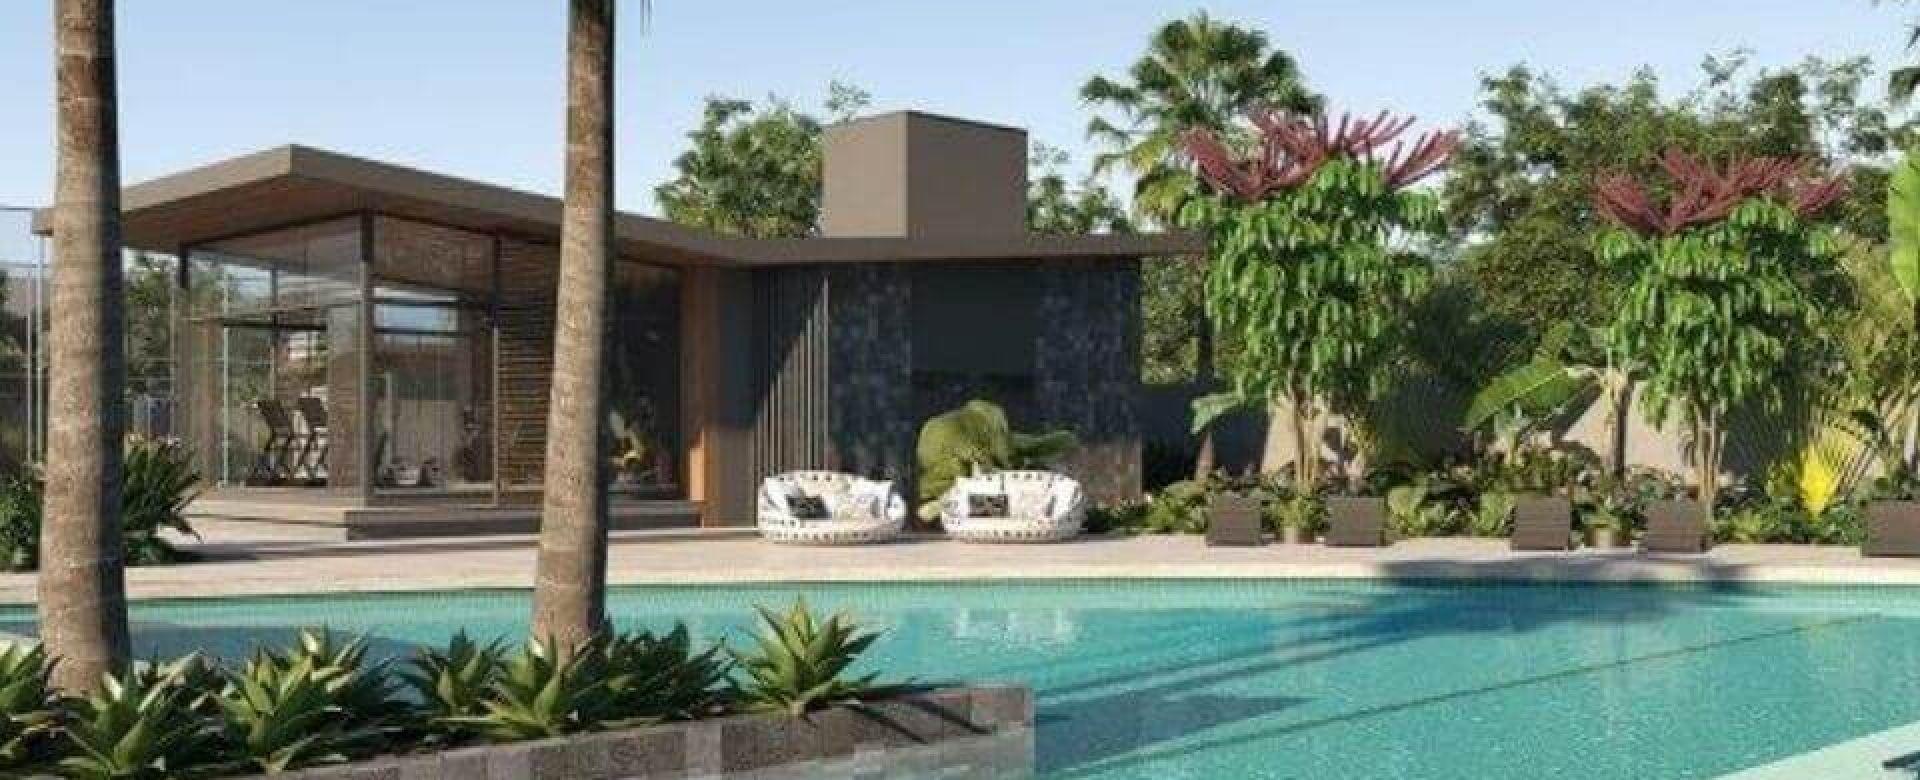 Swami Beach Residence, foto 1